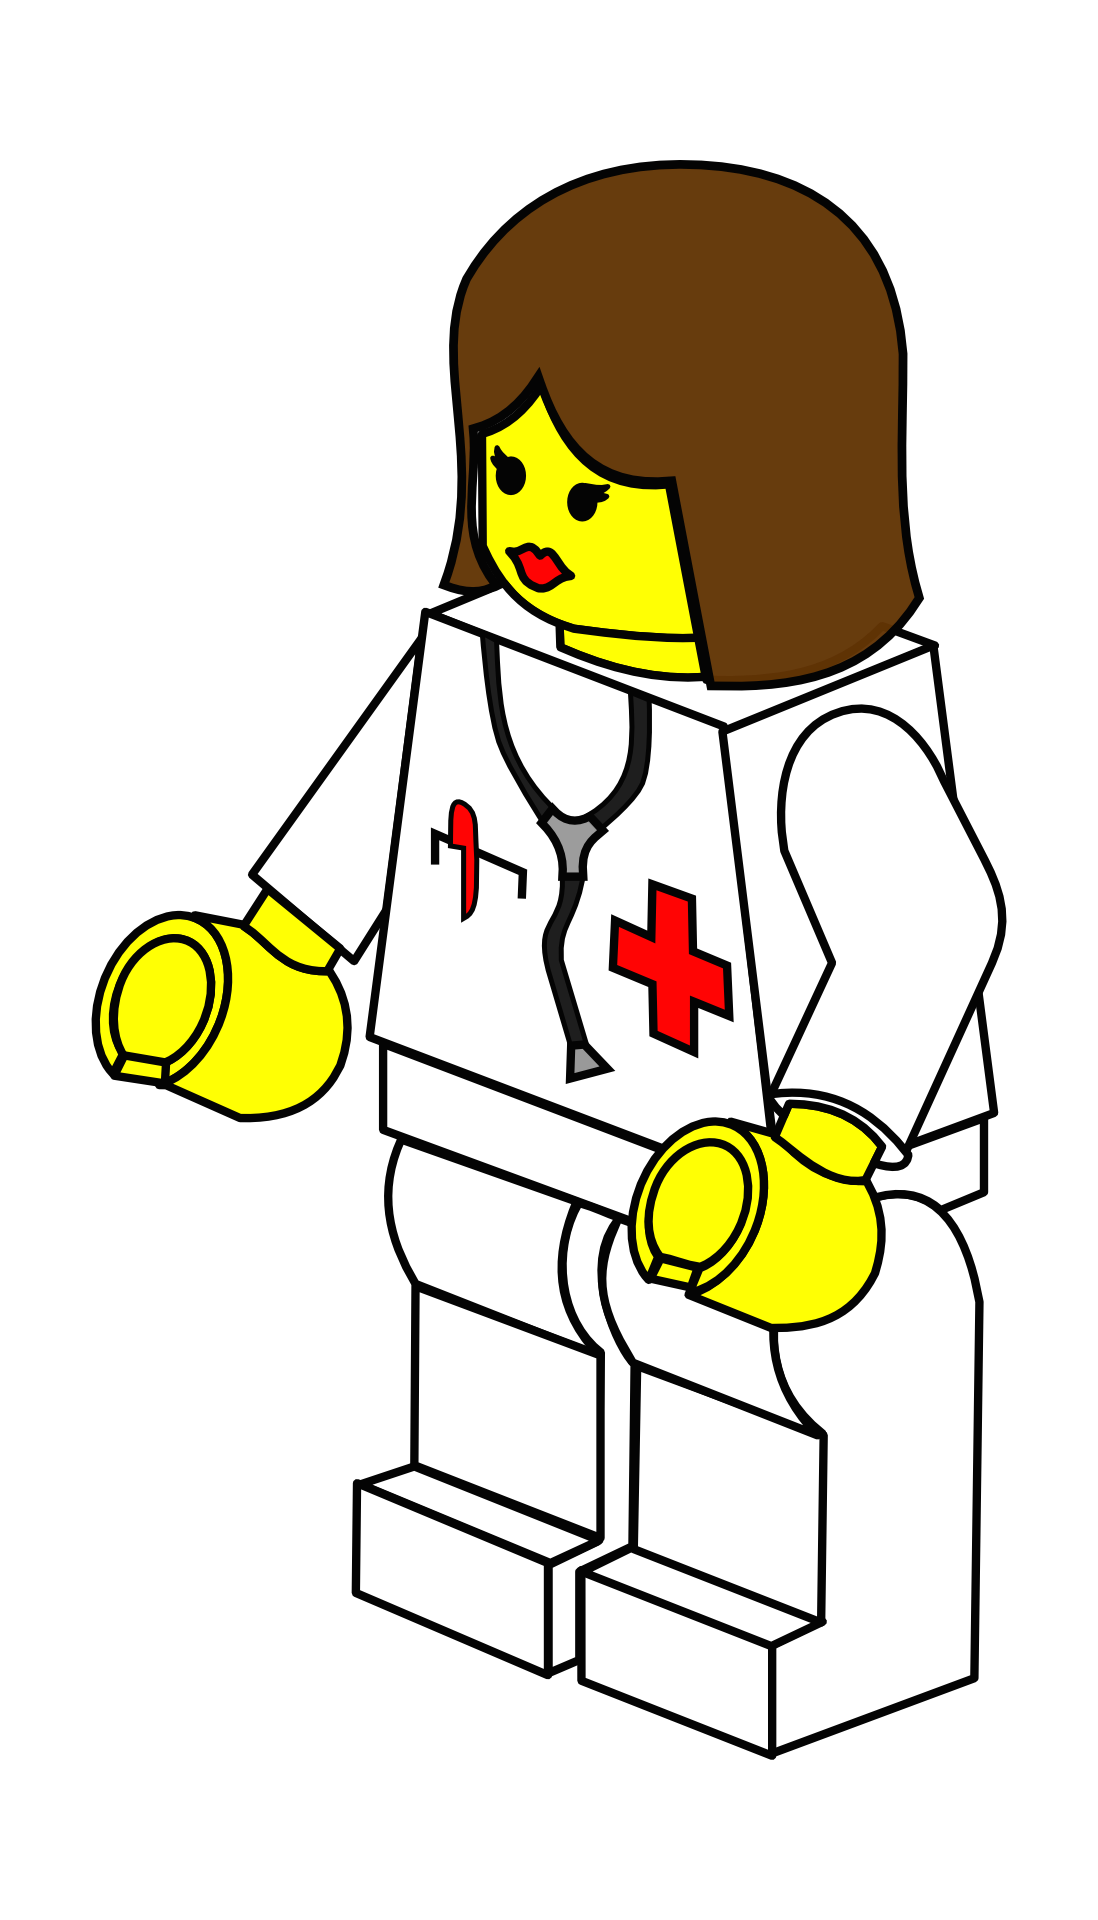 1098x1920 Lego City Lego Minifigure Clip Art